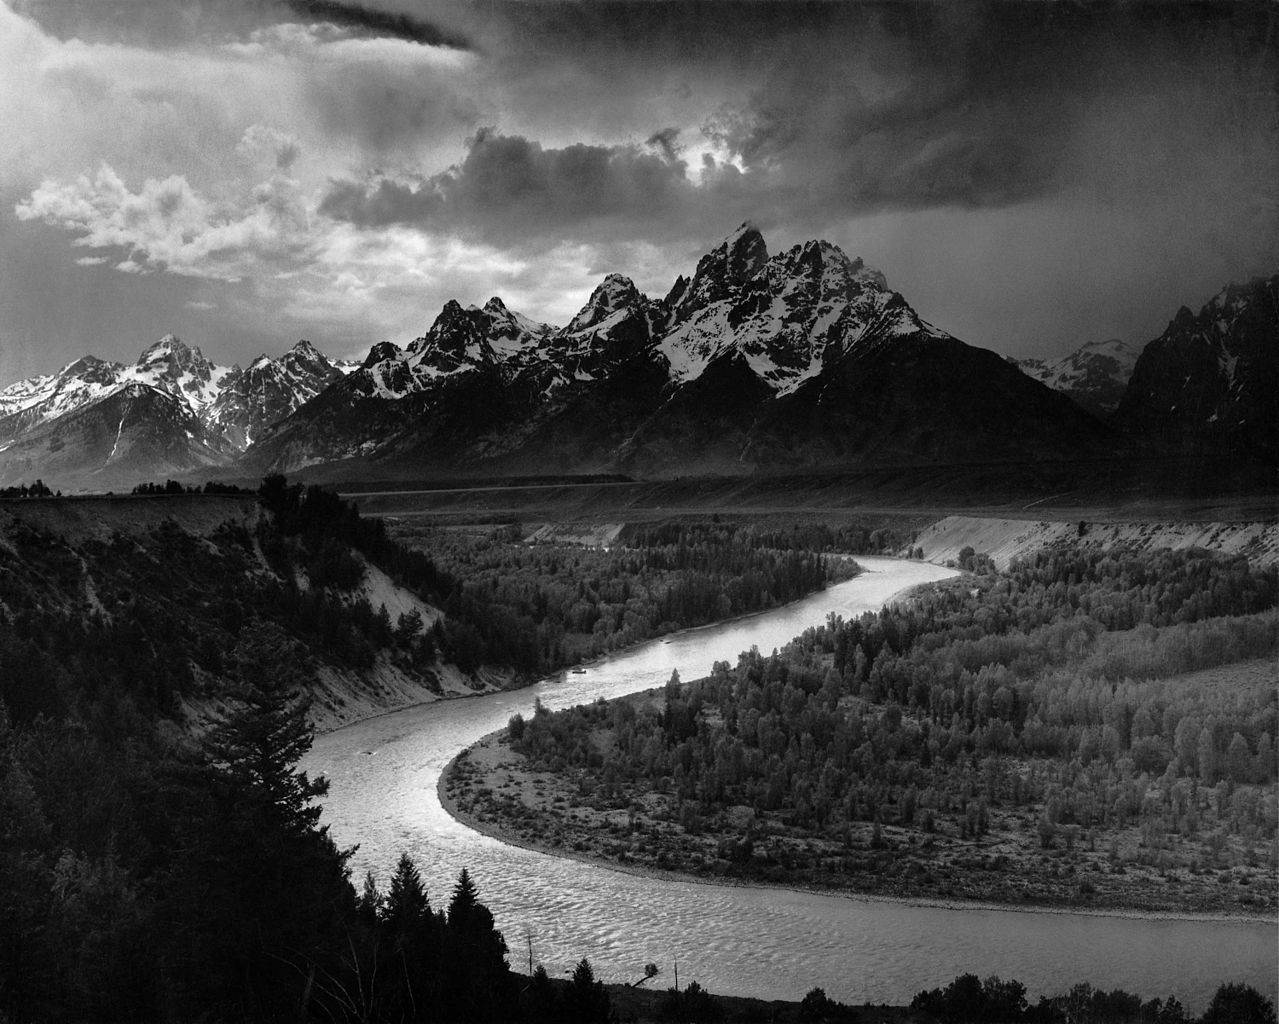 Ansel Adams, The Tetons and Snake River, Grand Teton National Park, Wyoming (1942)